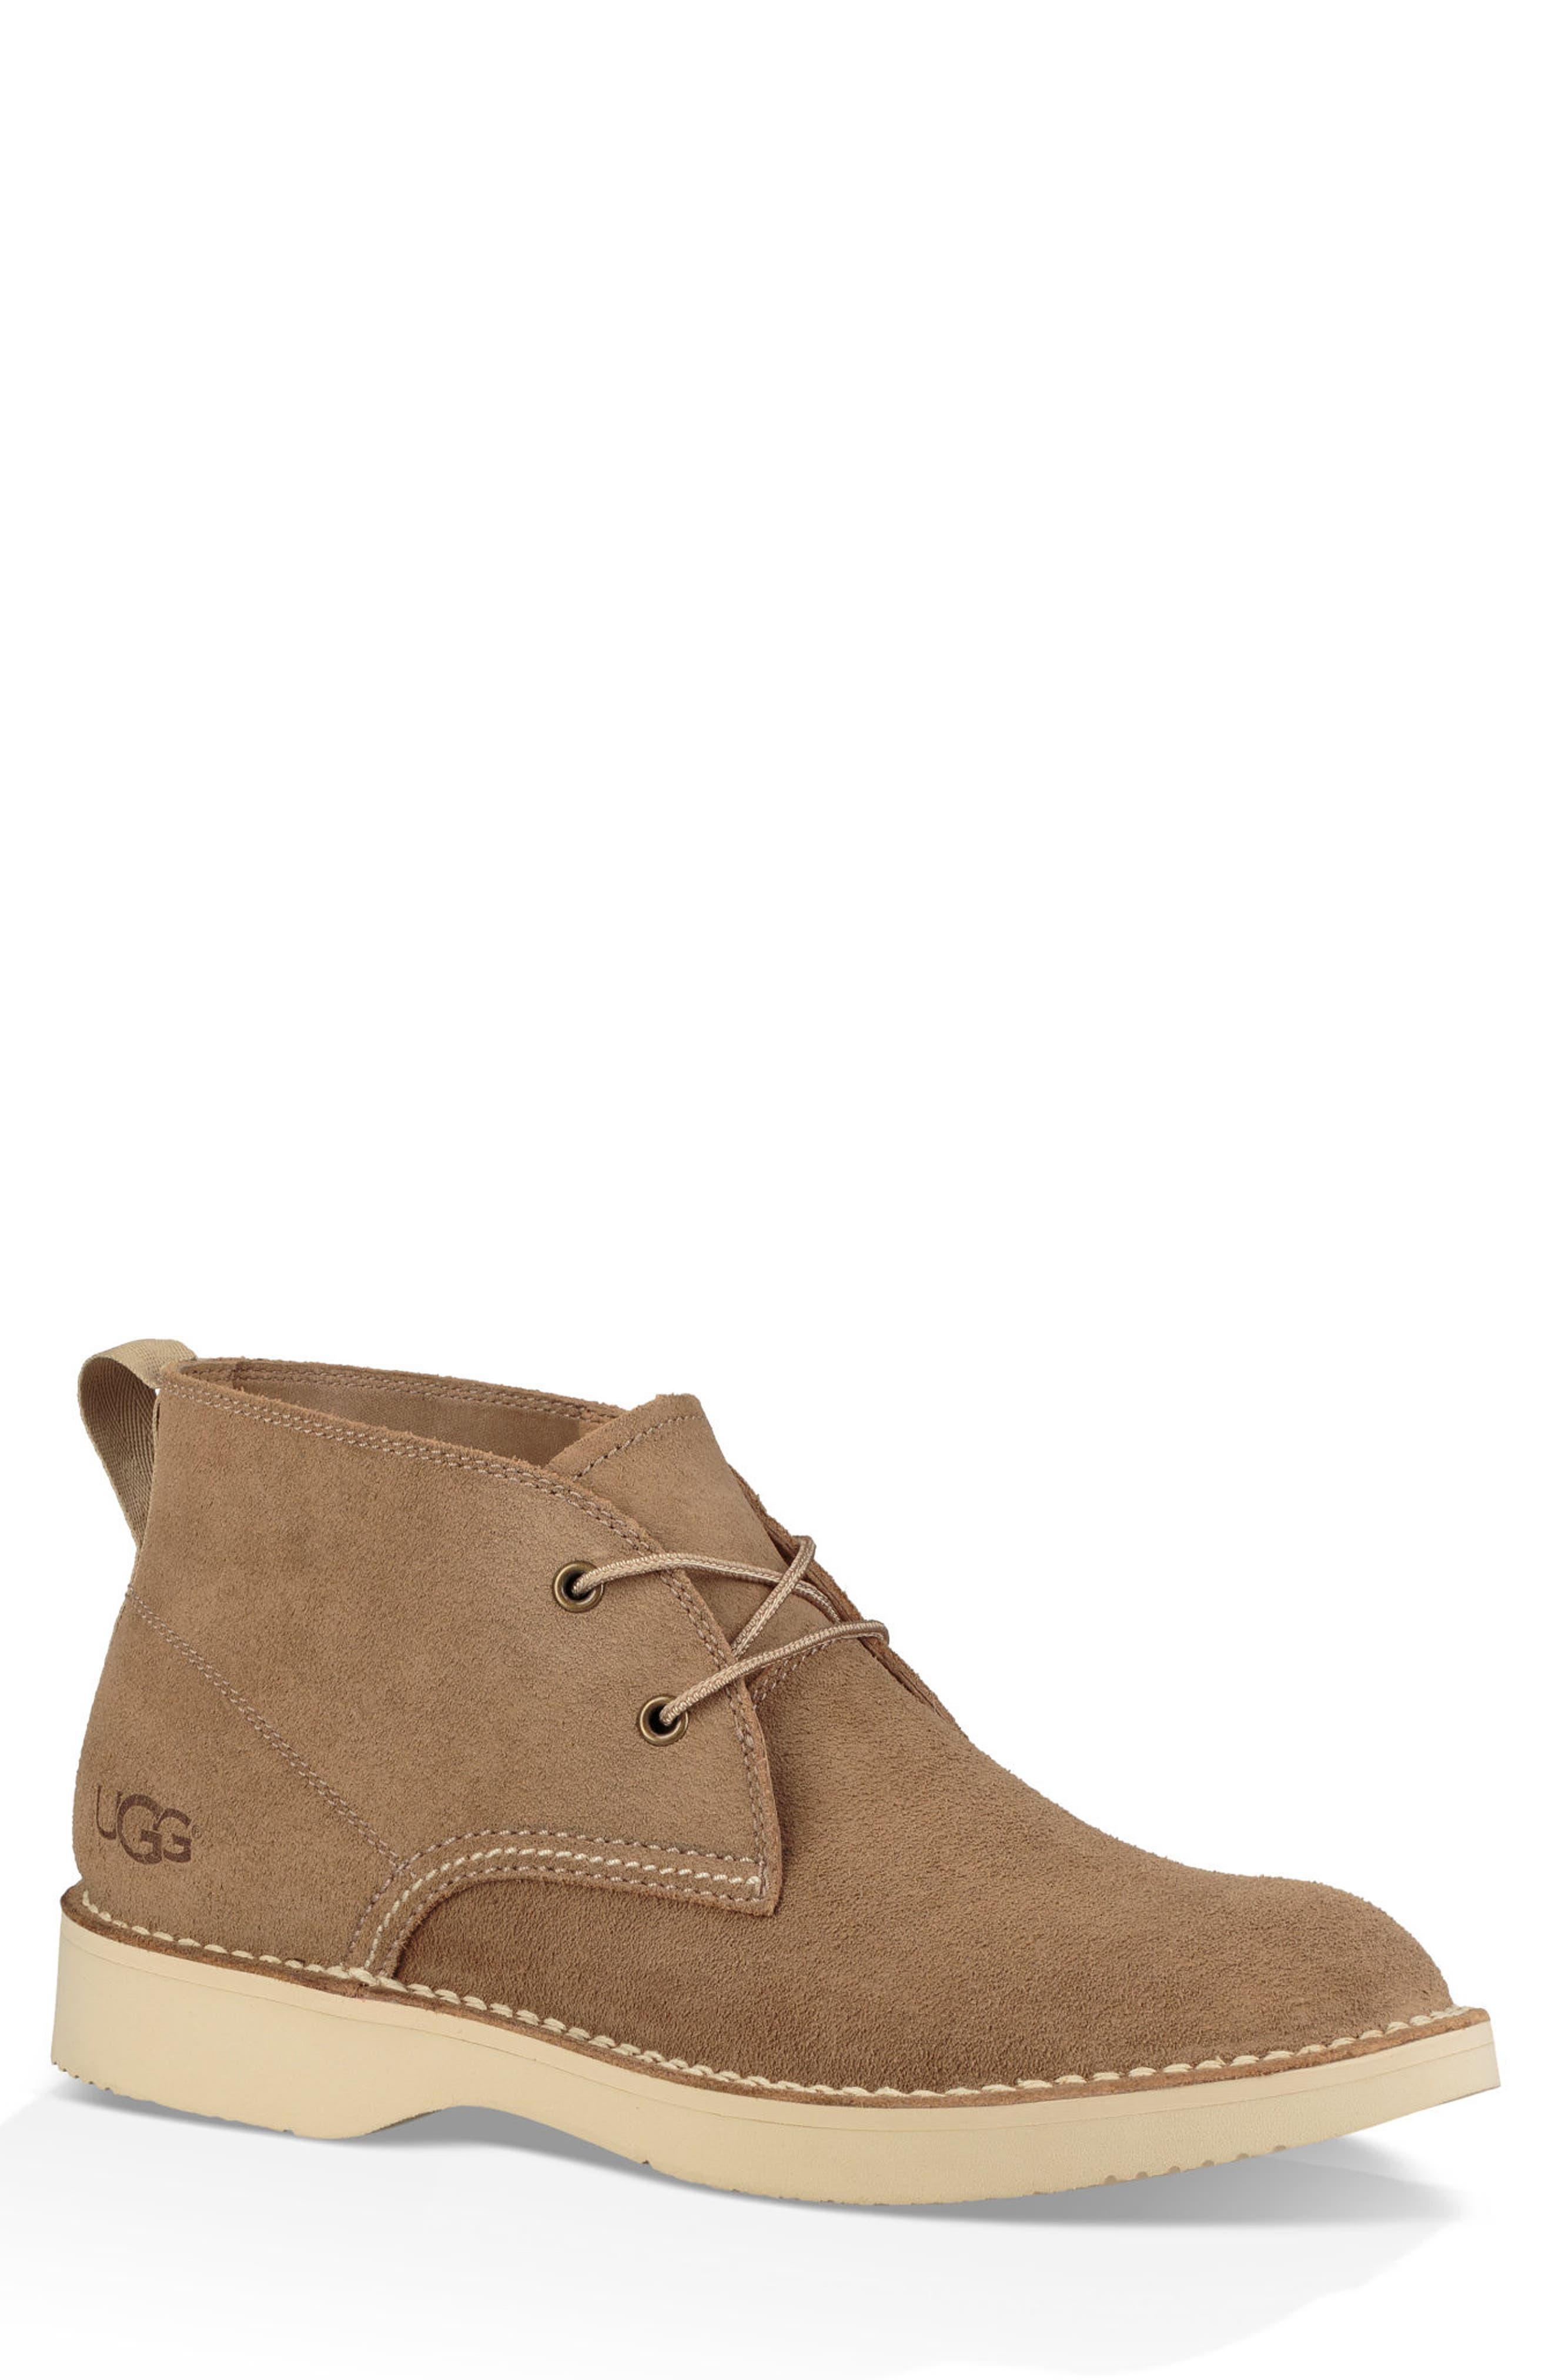 Ugg Camino Water Resistant Chukka Boot- Brown